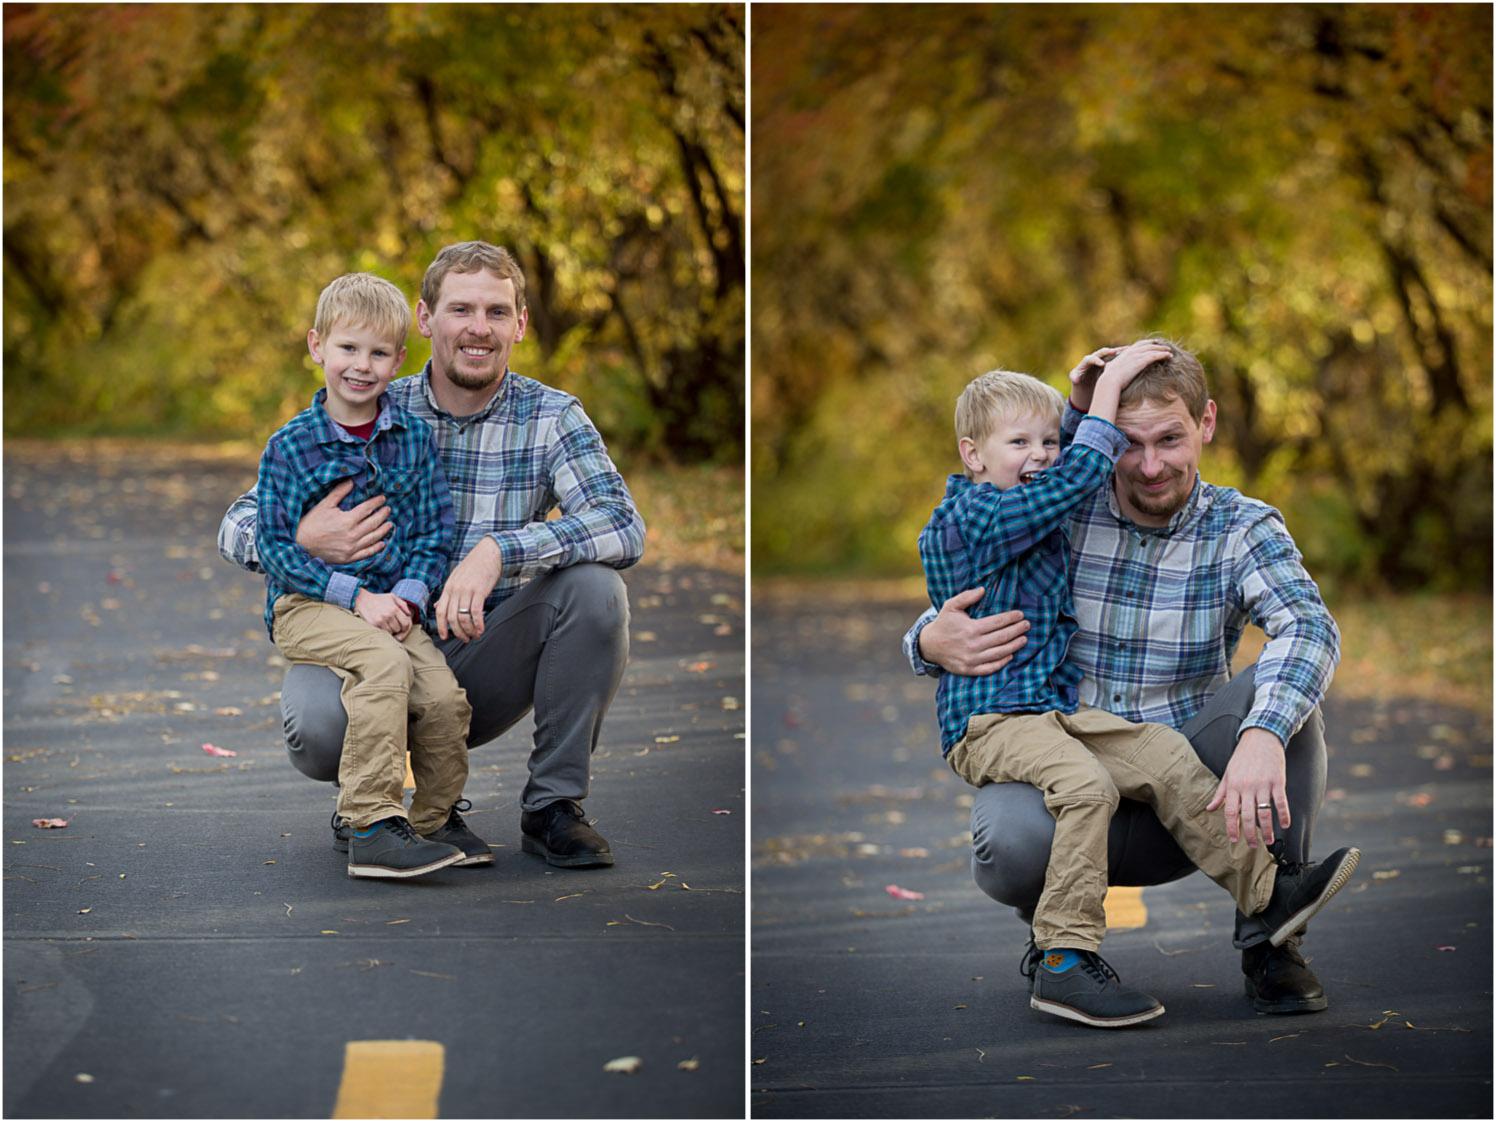 04-minnesota-fall-colors-father-son-family-photo-session-mahonen-photography.jpg